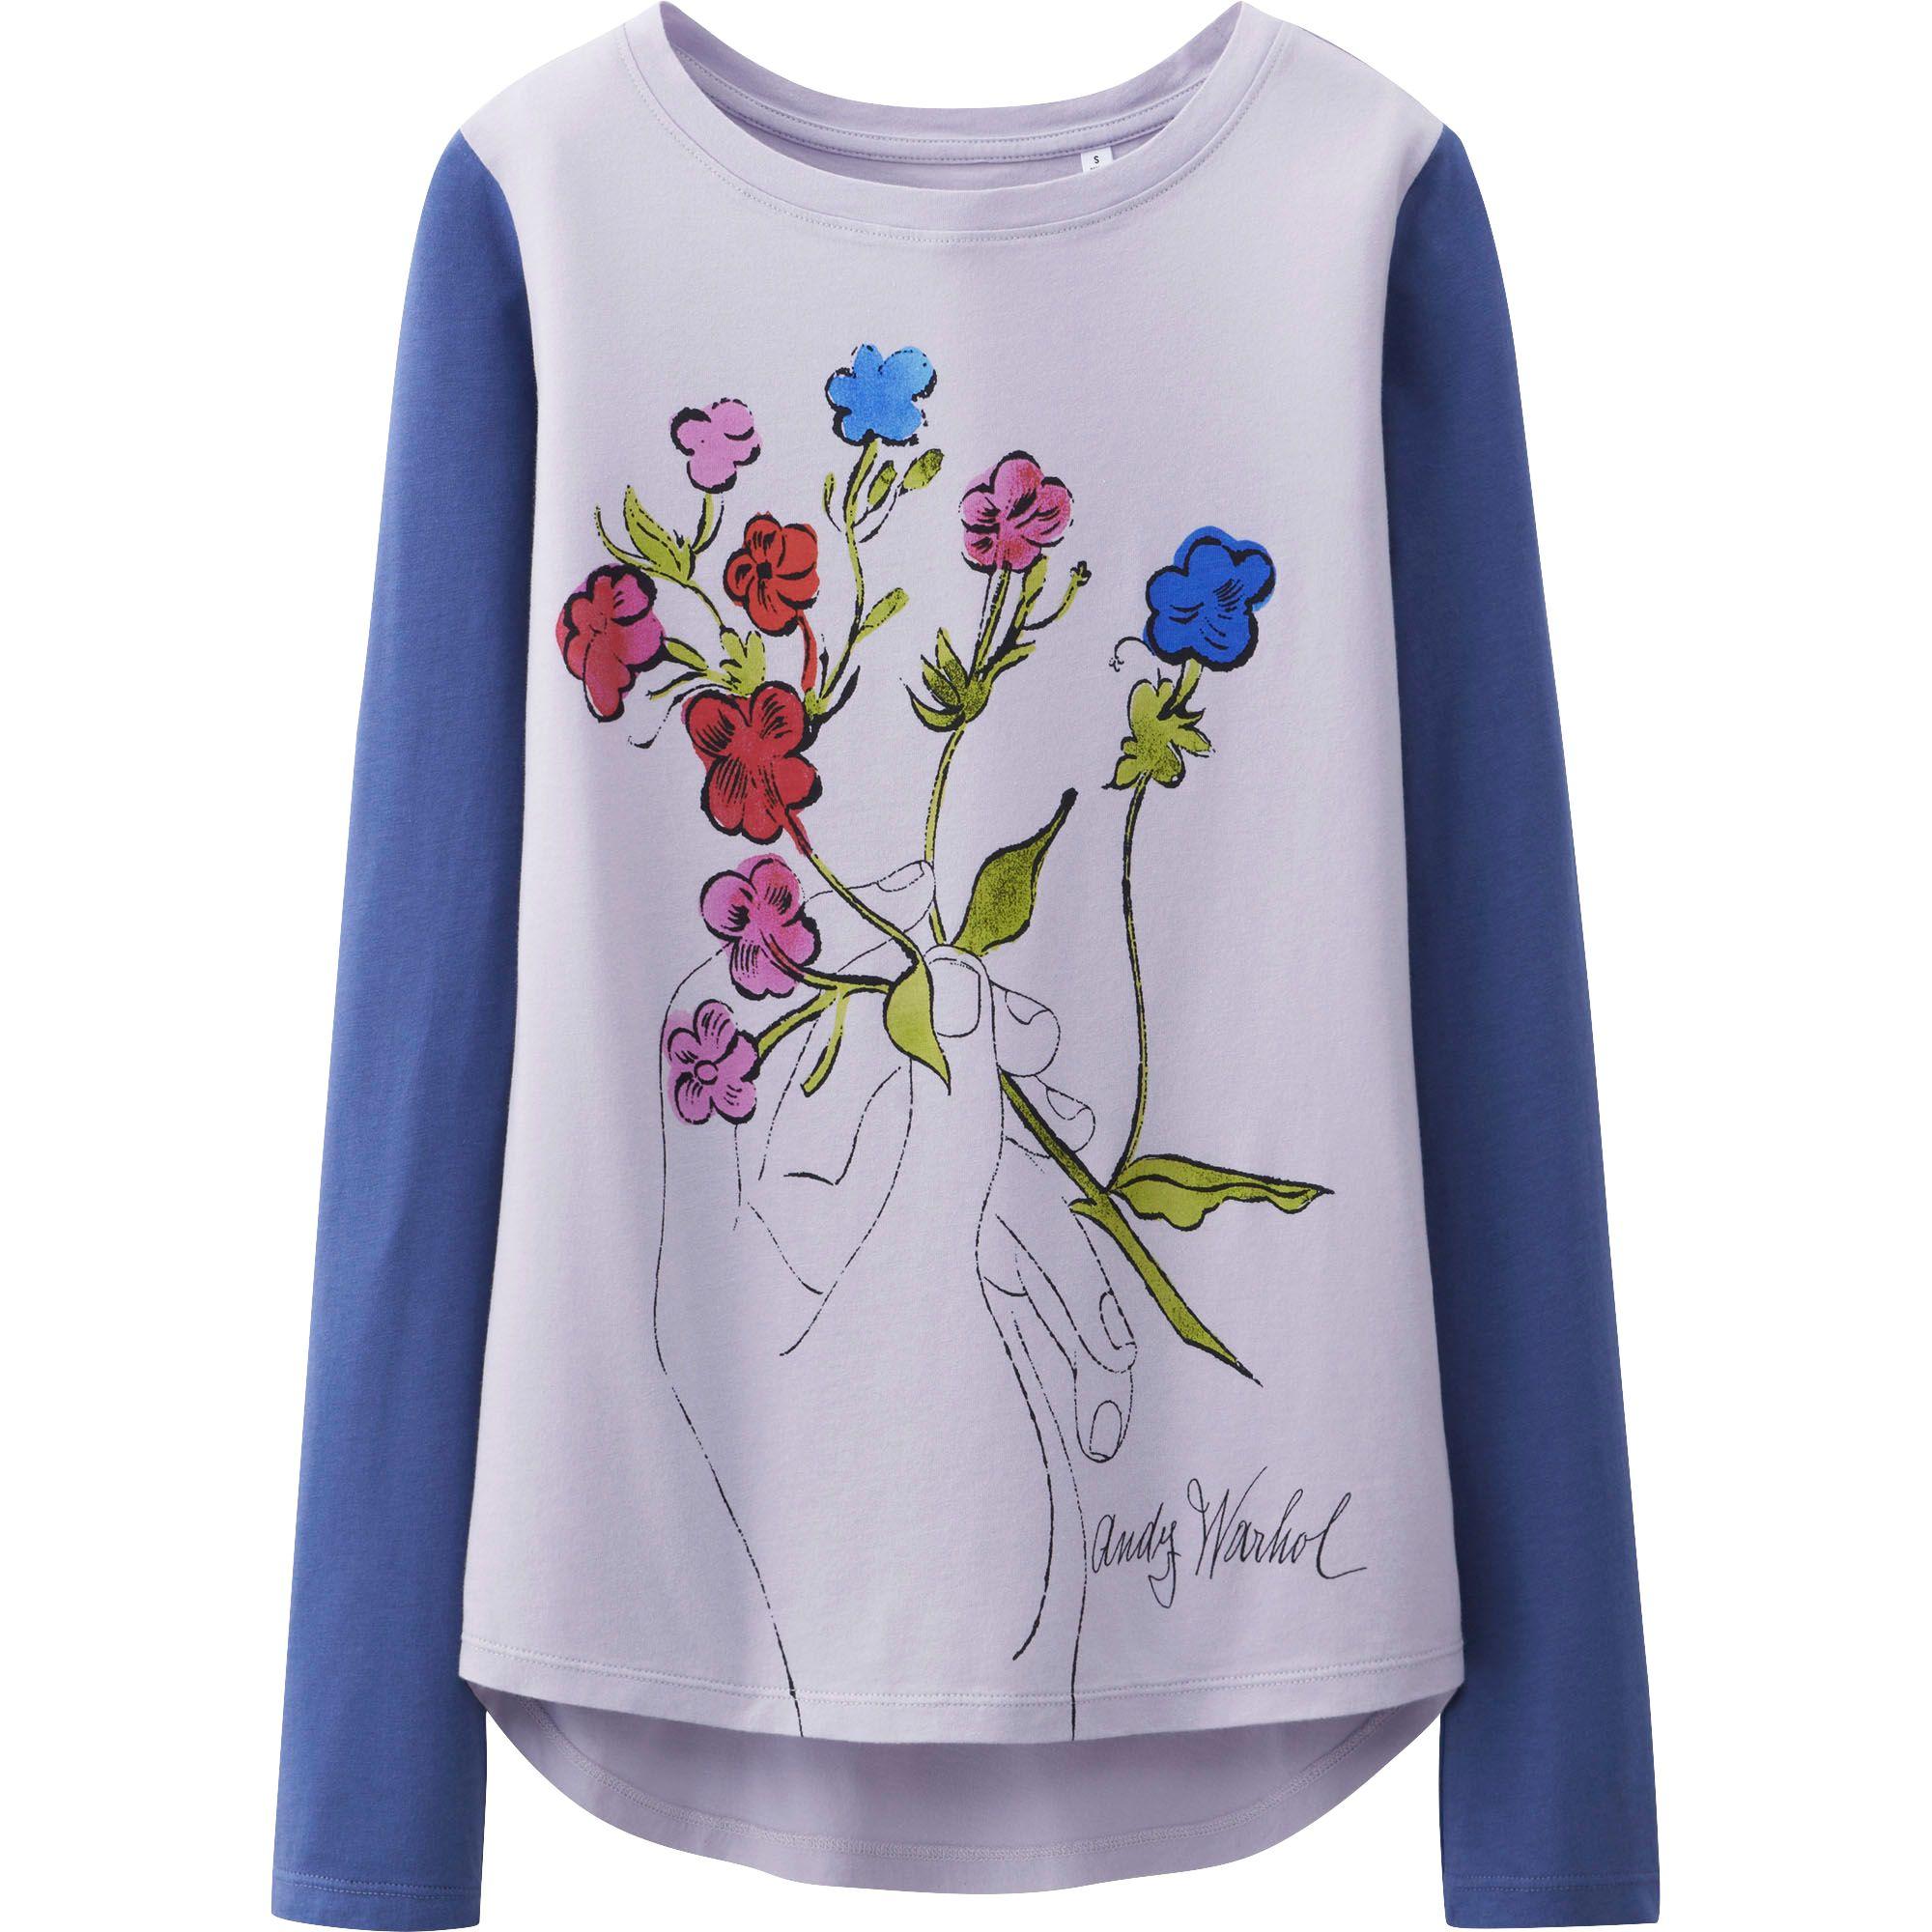 Uniqlo Women Sprz Ny Long Sleeve Graphic T Shirt Andy